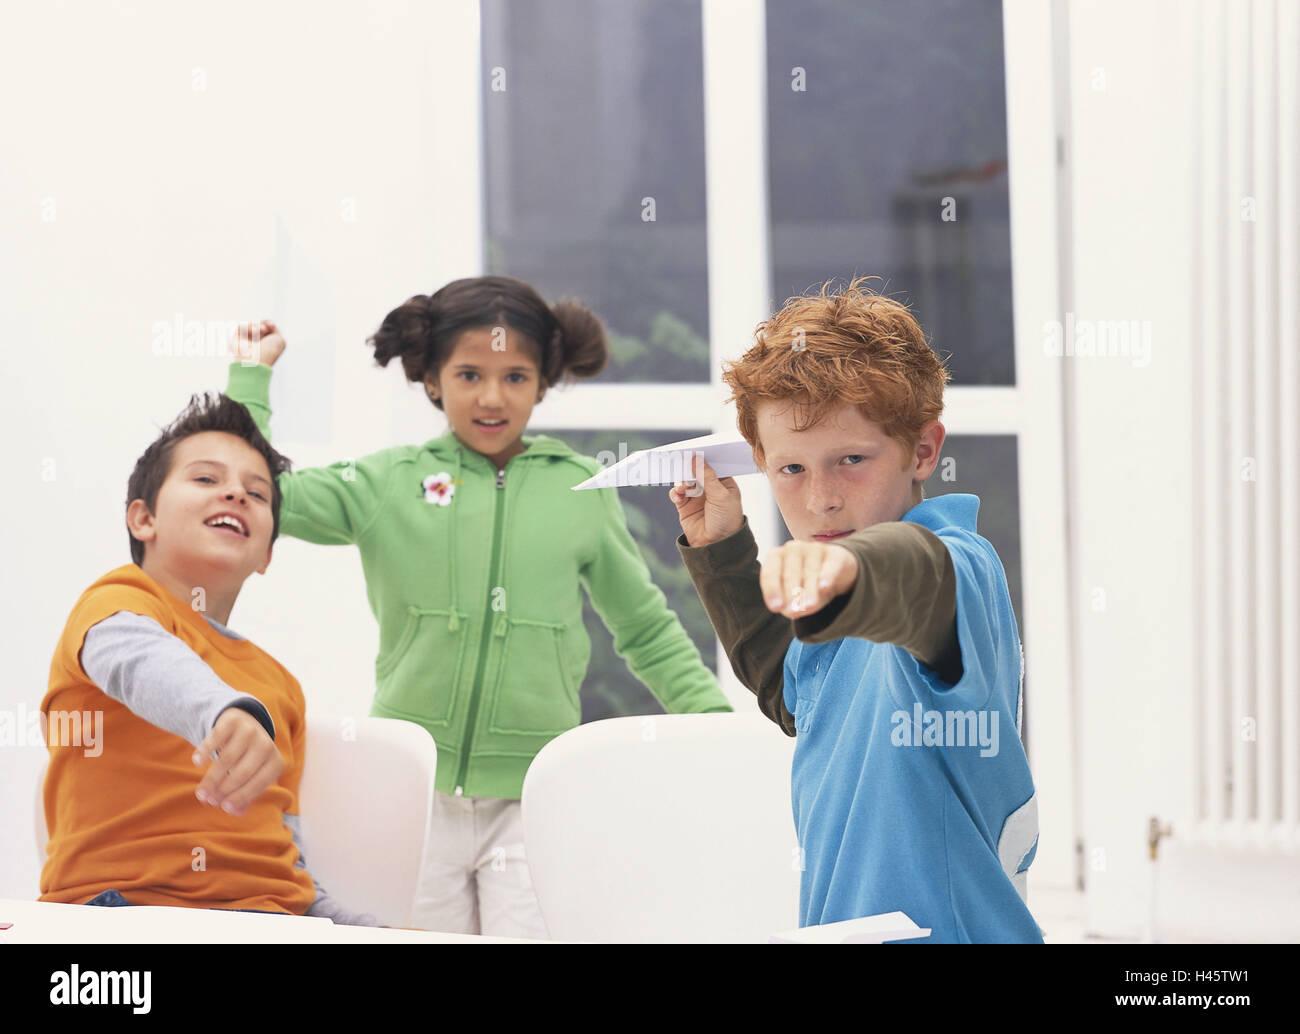 schule unterricht pause schuljunge papierflieger. Black Bedroom Furniture Sets. Home Design Ideas